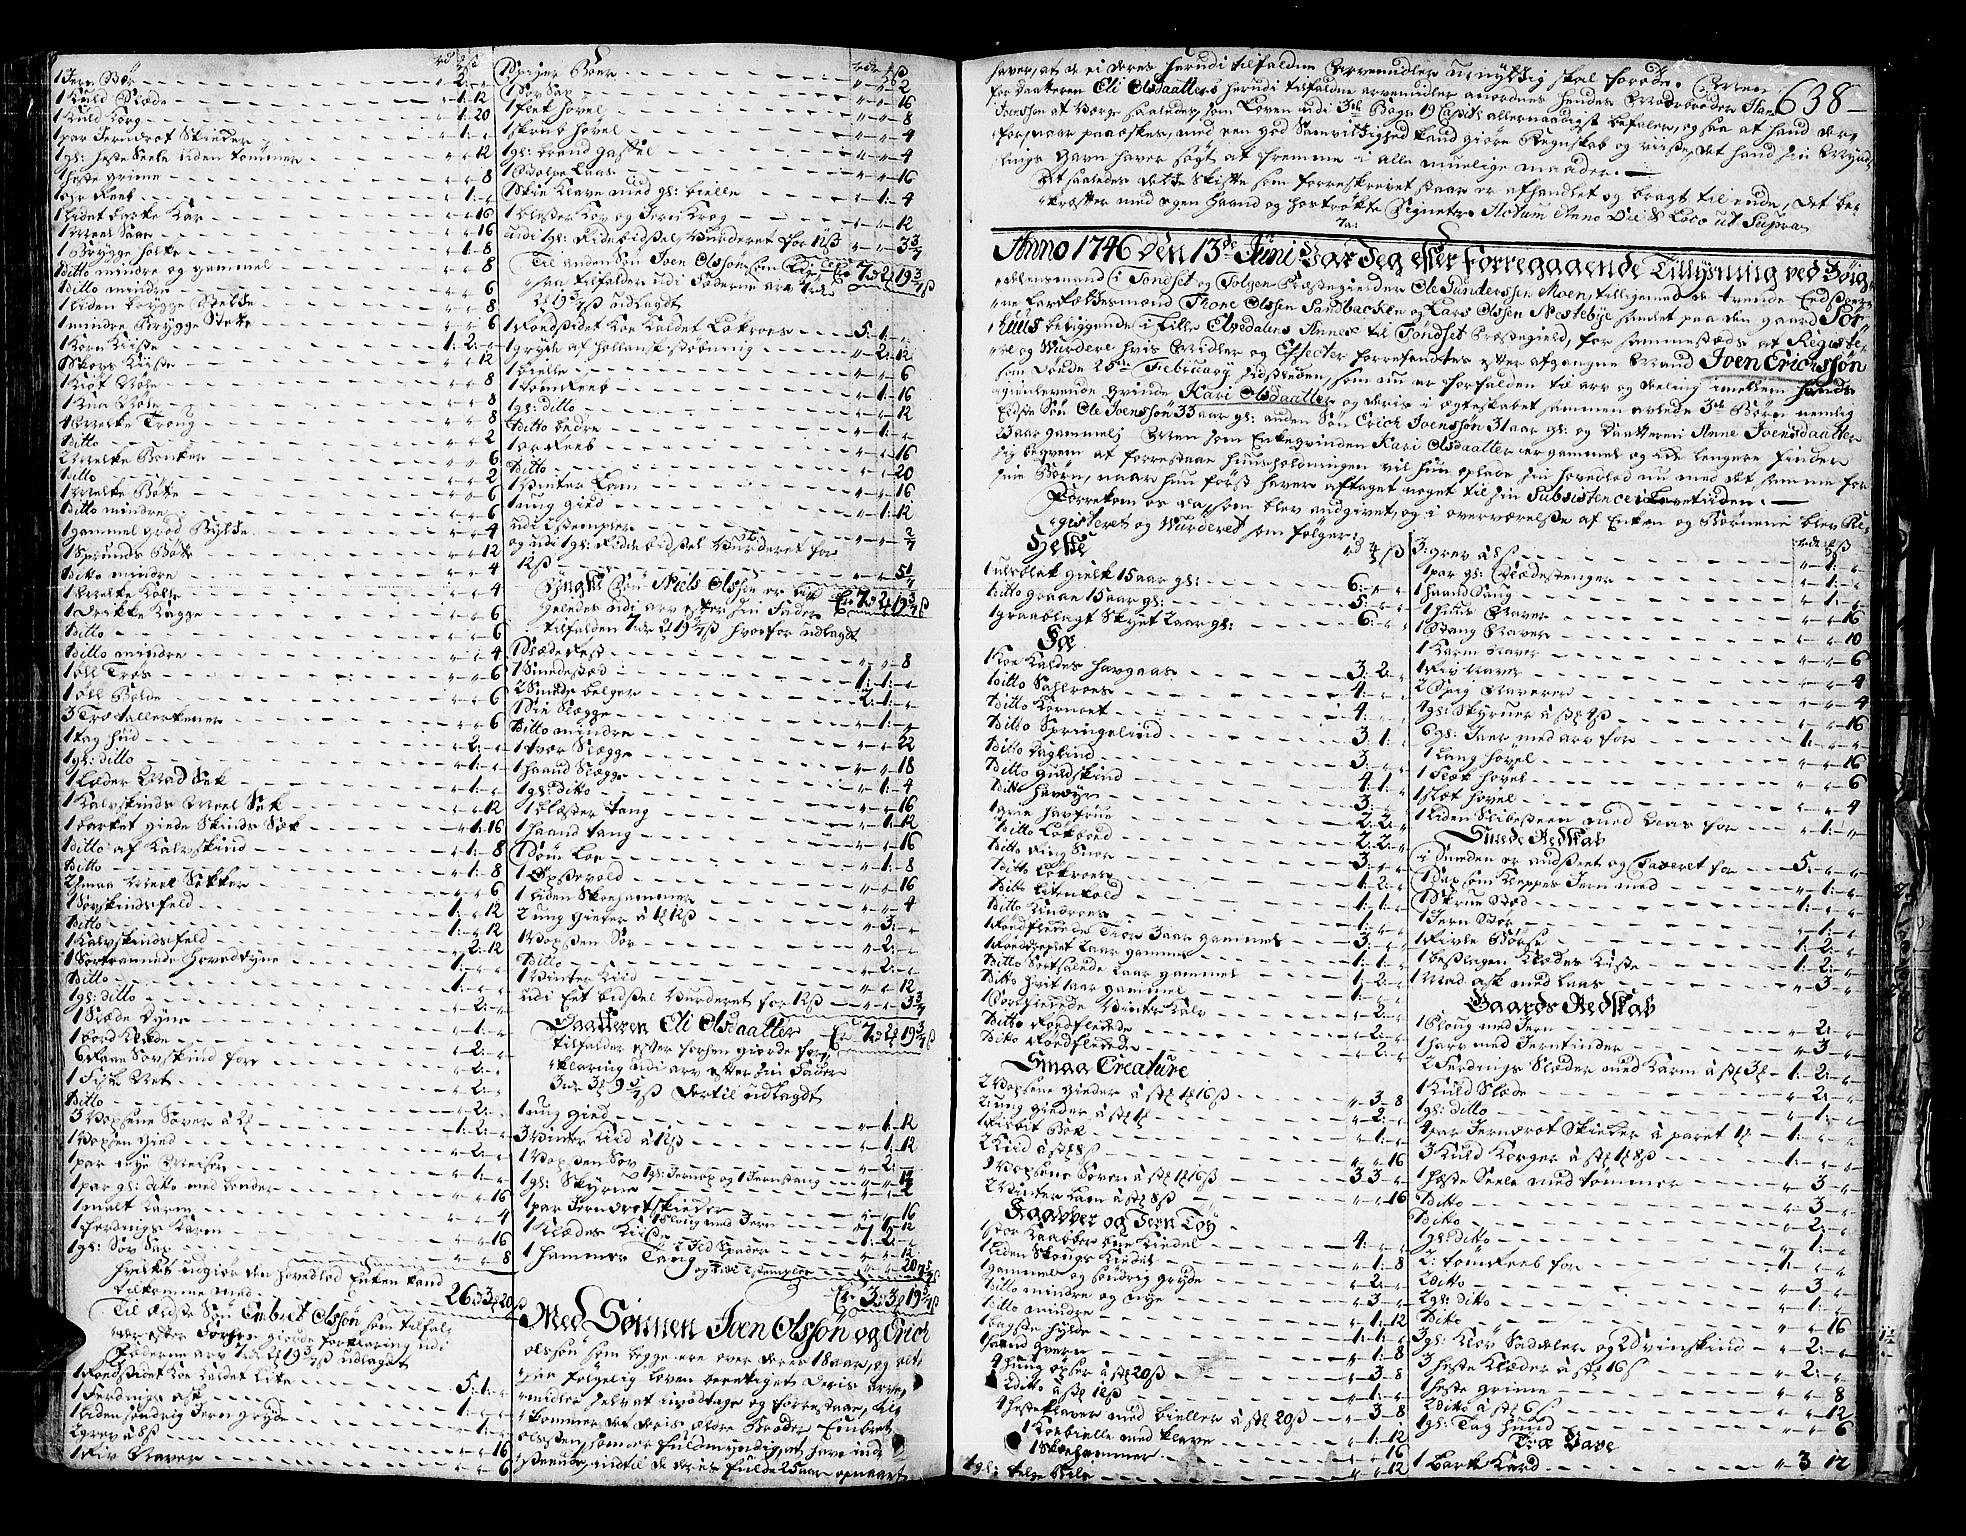 SAH, Solør og Østerdalen sorenskriveri, J/Ja/L0008A: Skifteprotokoll, 1742-1747, s. 637b-638a